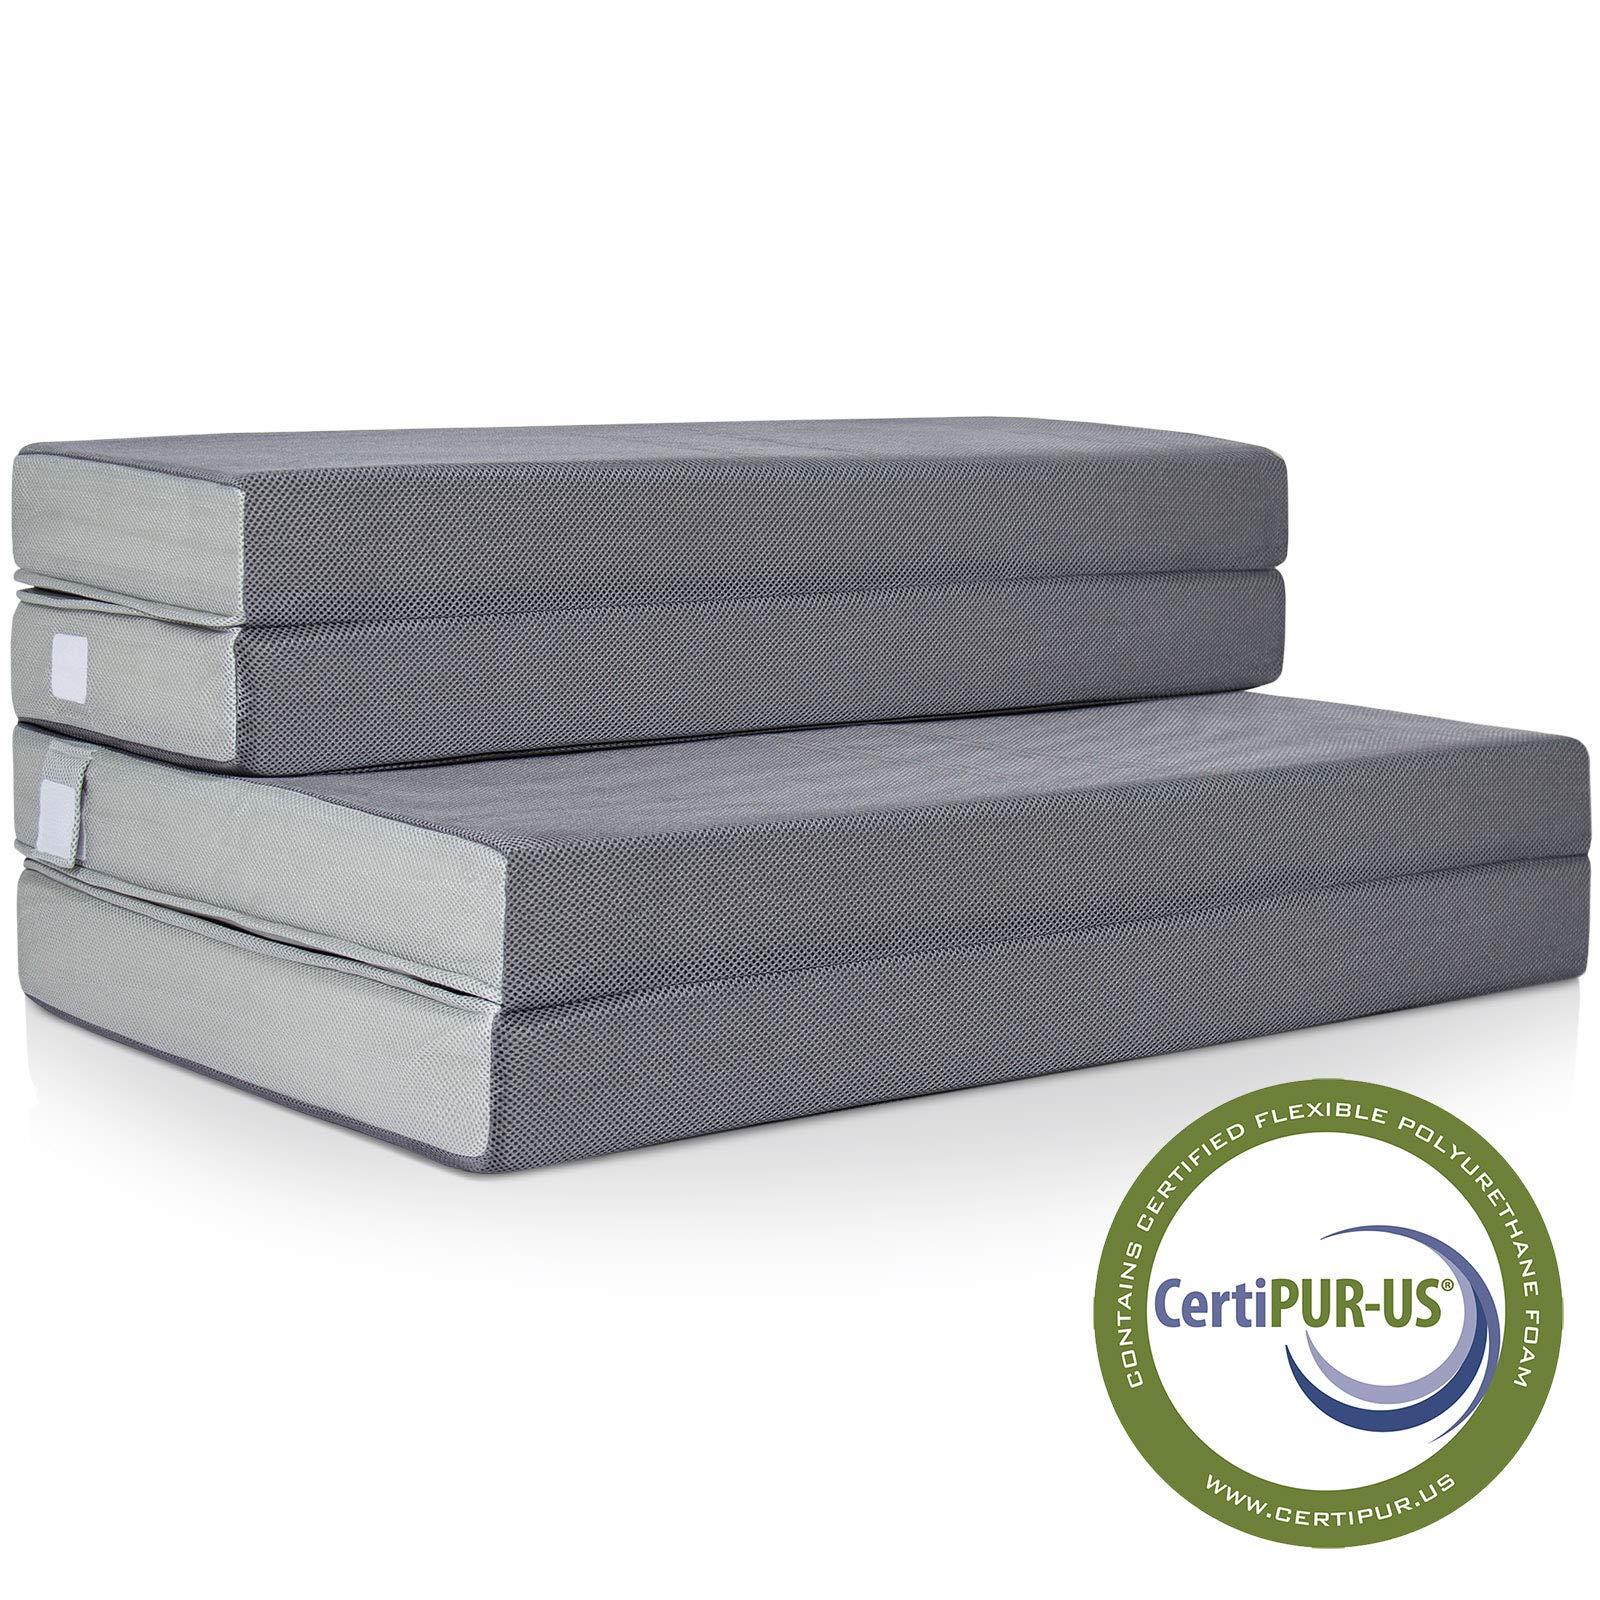 Best Choice Products SKY2760 Mattress, Queen, Gray